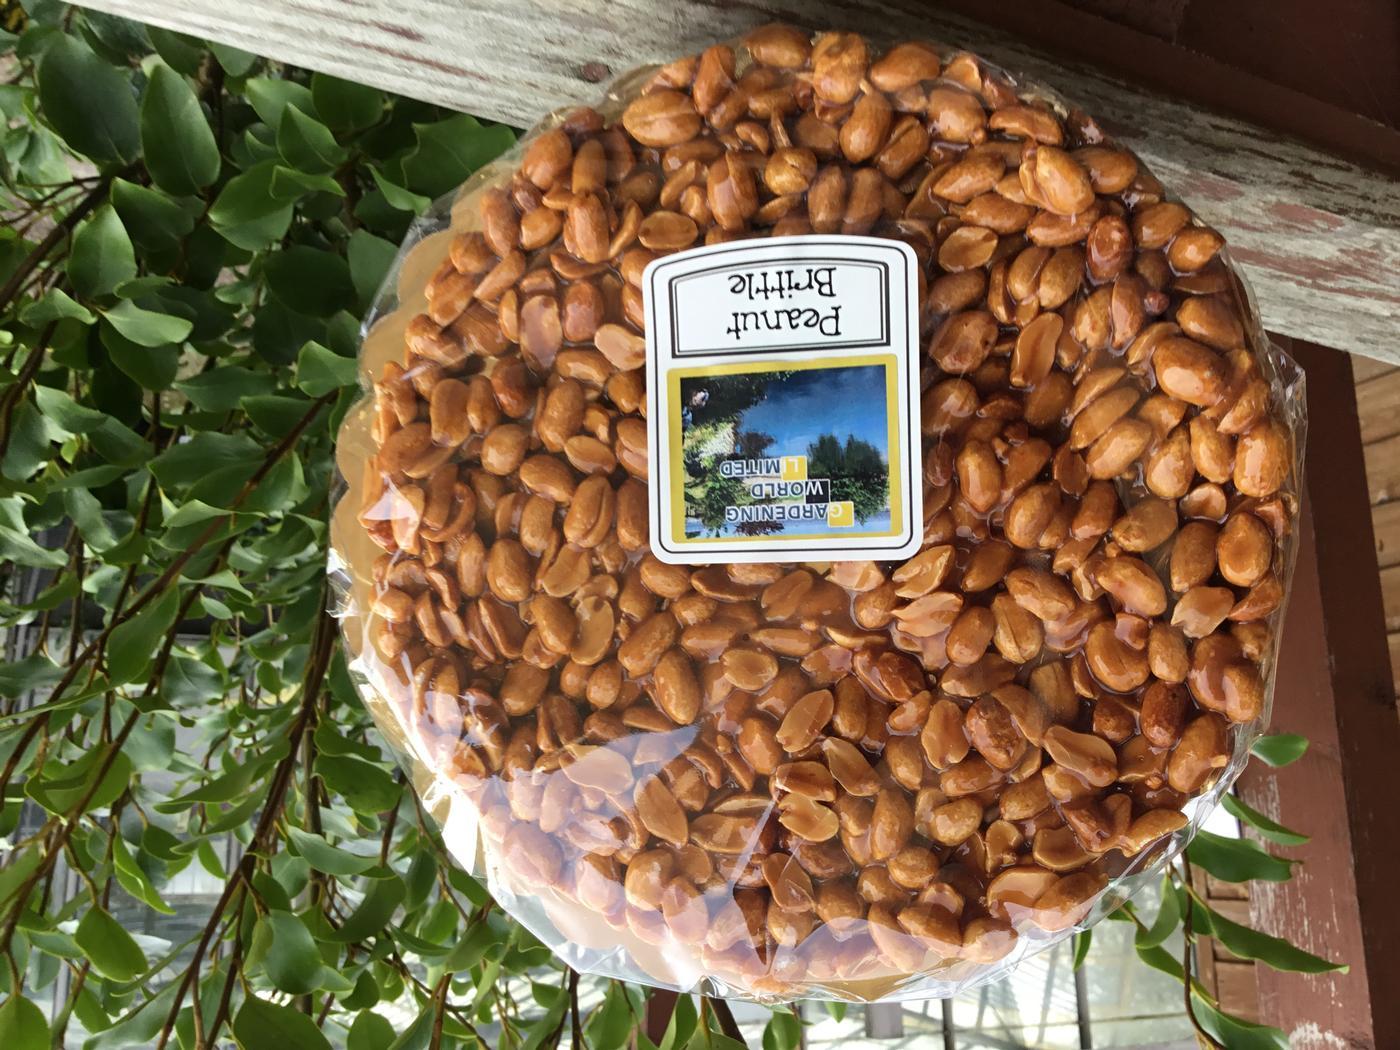 Massive Peanut Brittle